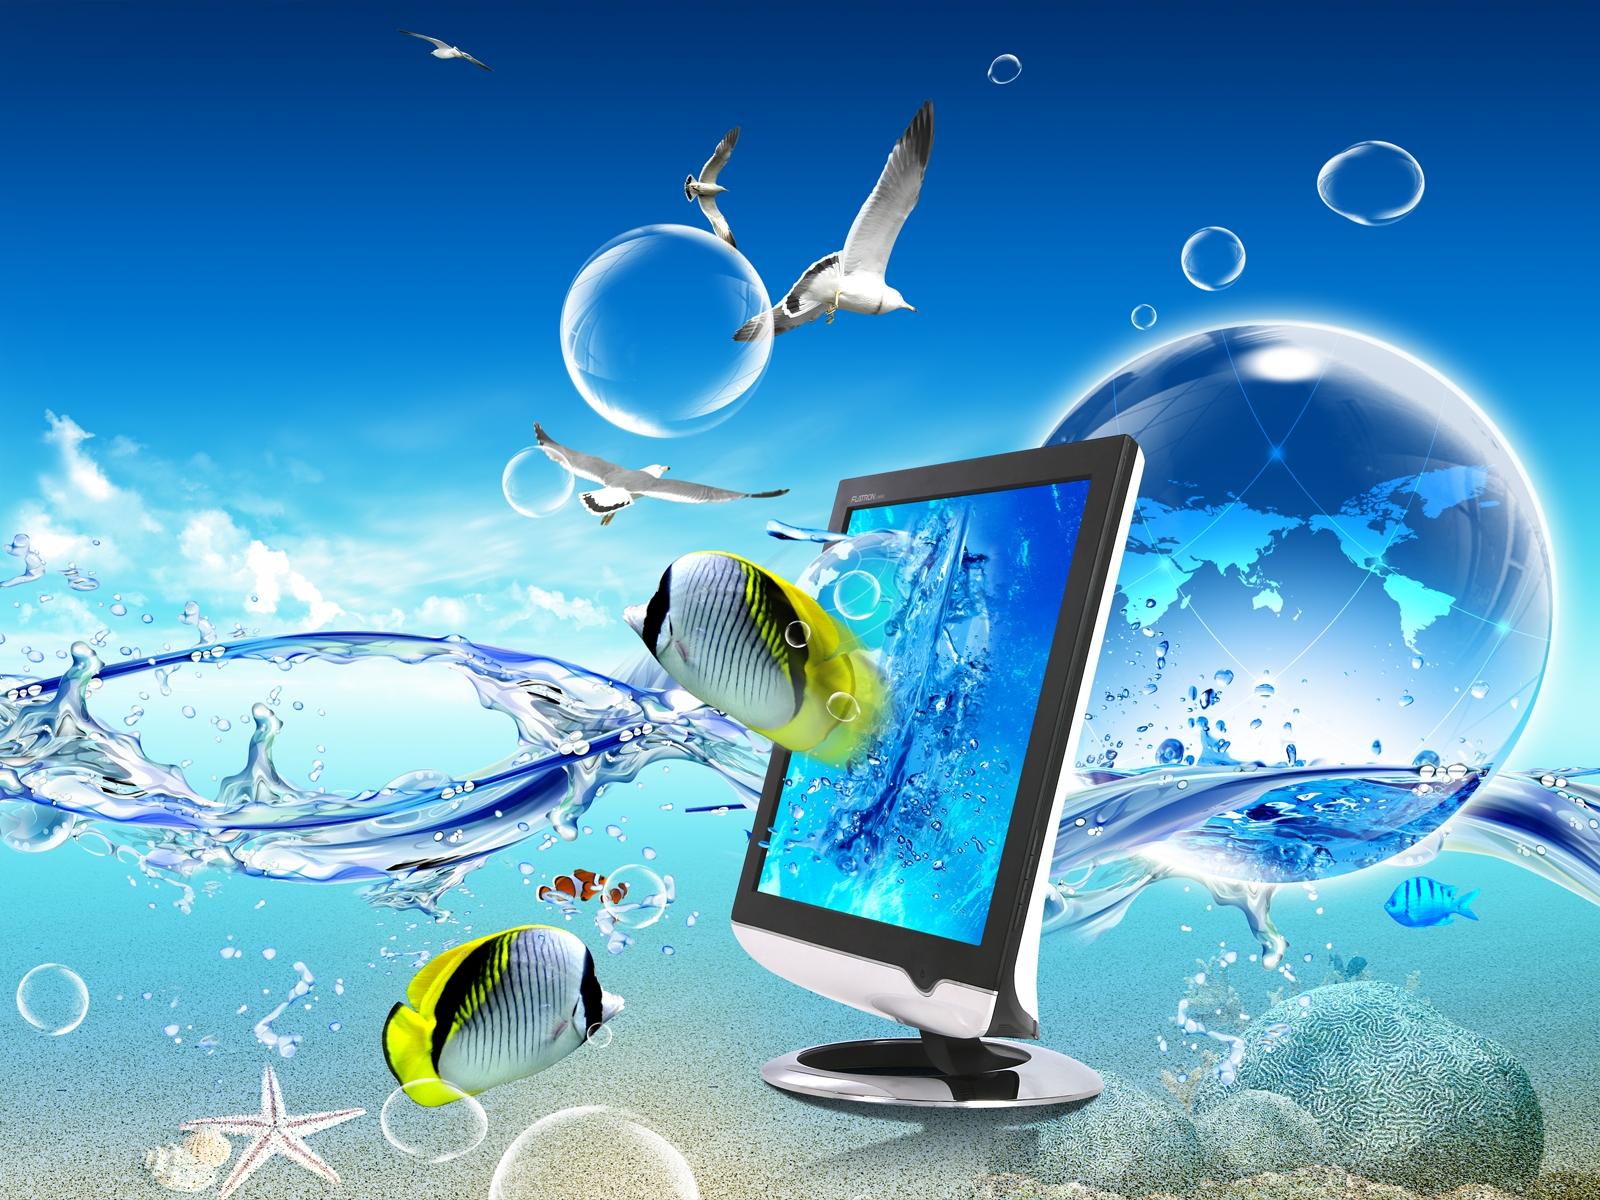 Free Laptop Wallpapers - WallpaperSafari